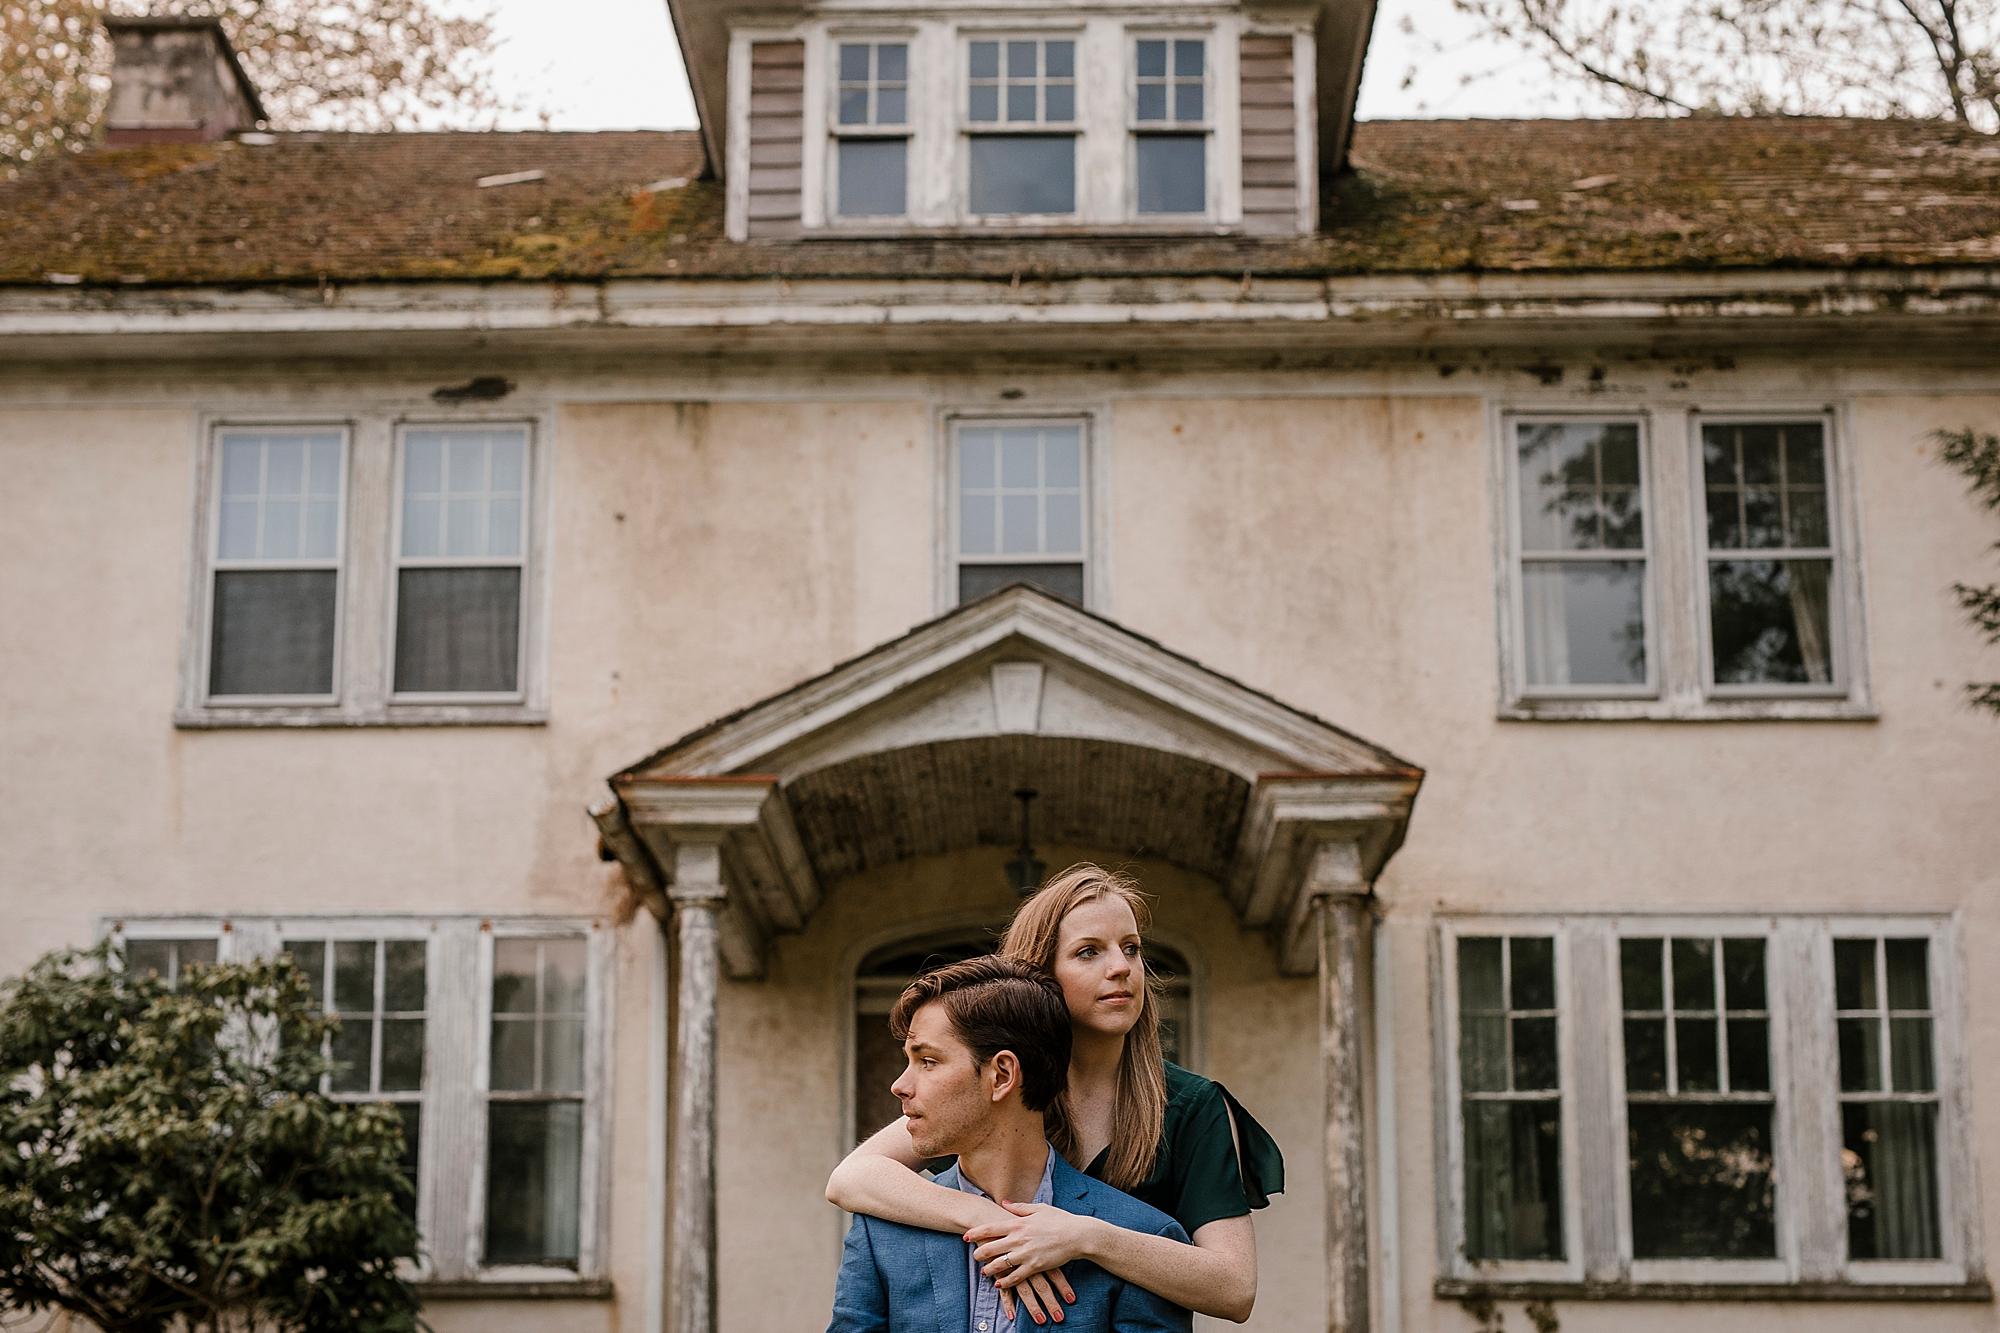 Tori_Zack_Glen_Mills_Terrain Cafe_Wedding_Engagement_Photography_Joe_Mac_Creative__0043.jpg